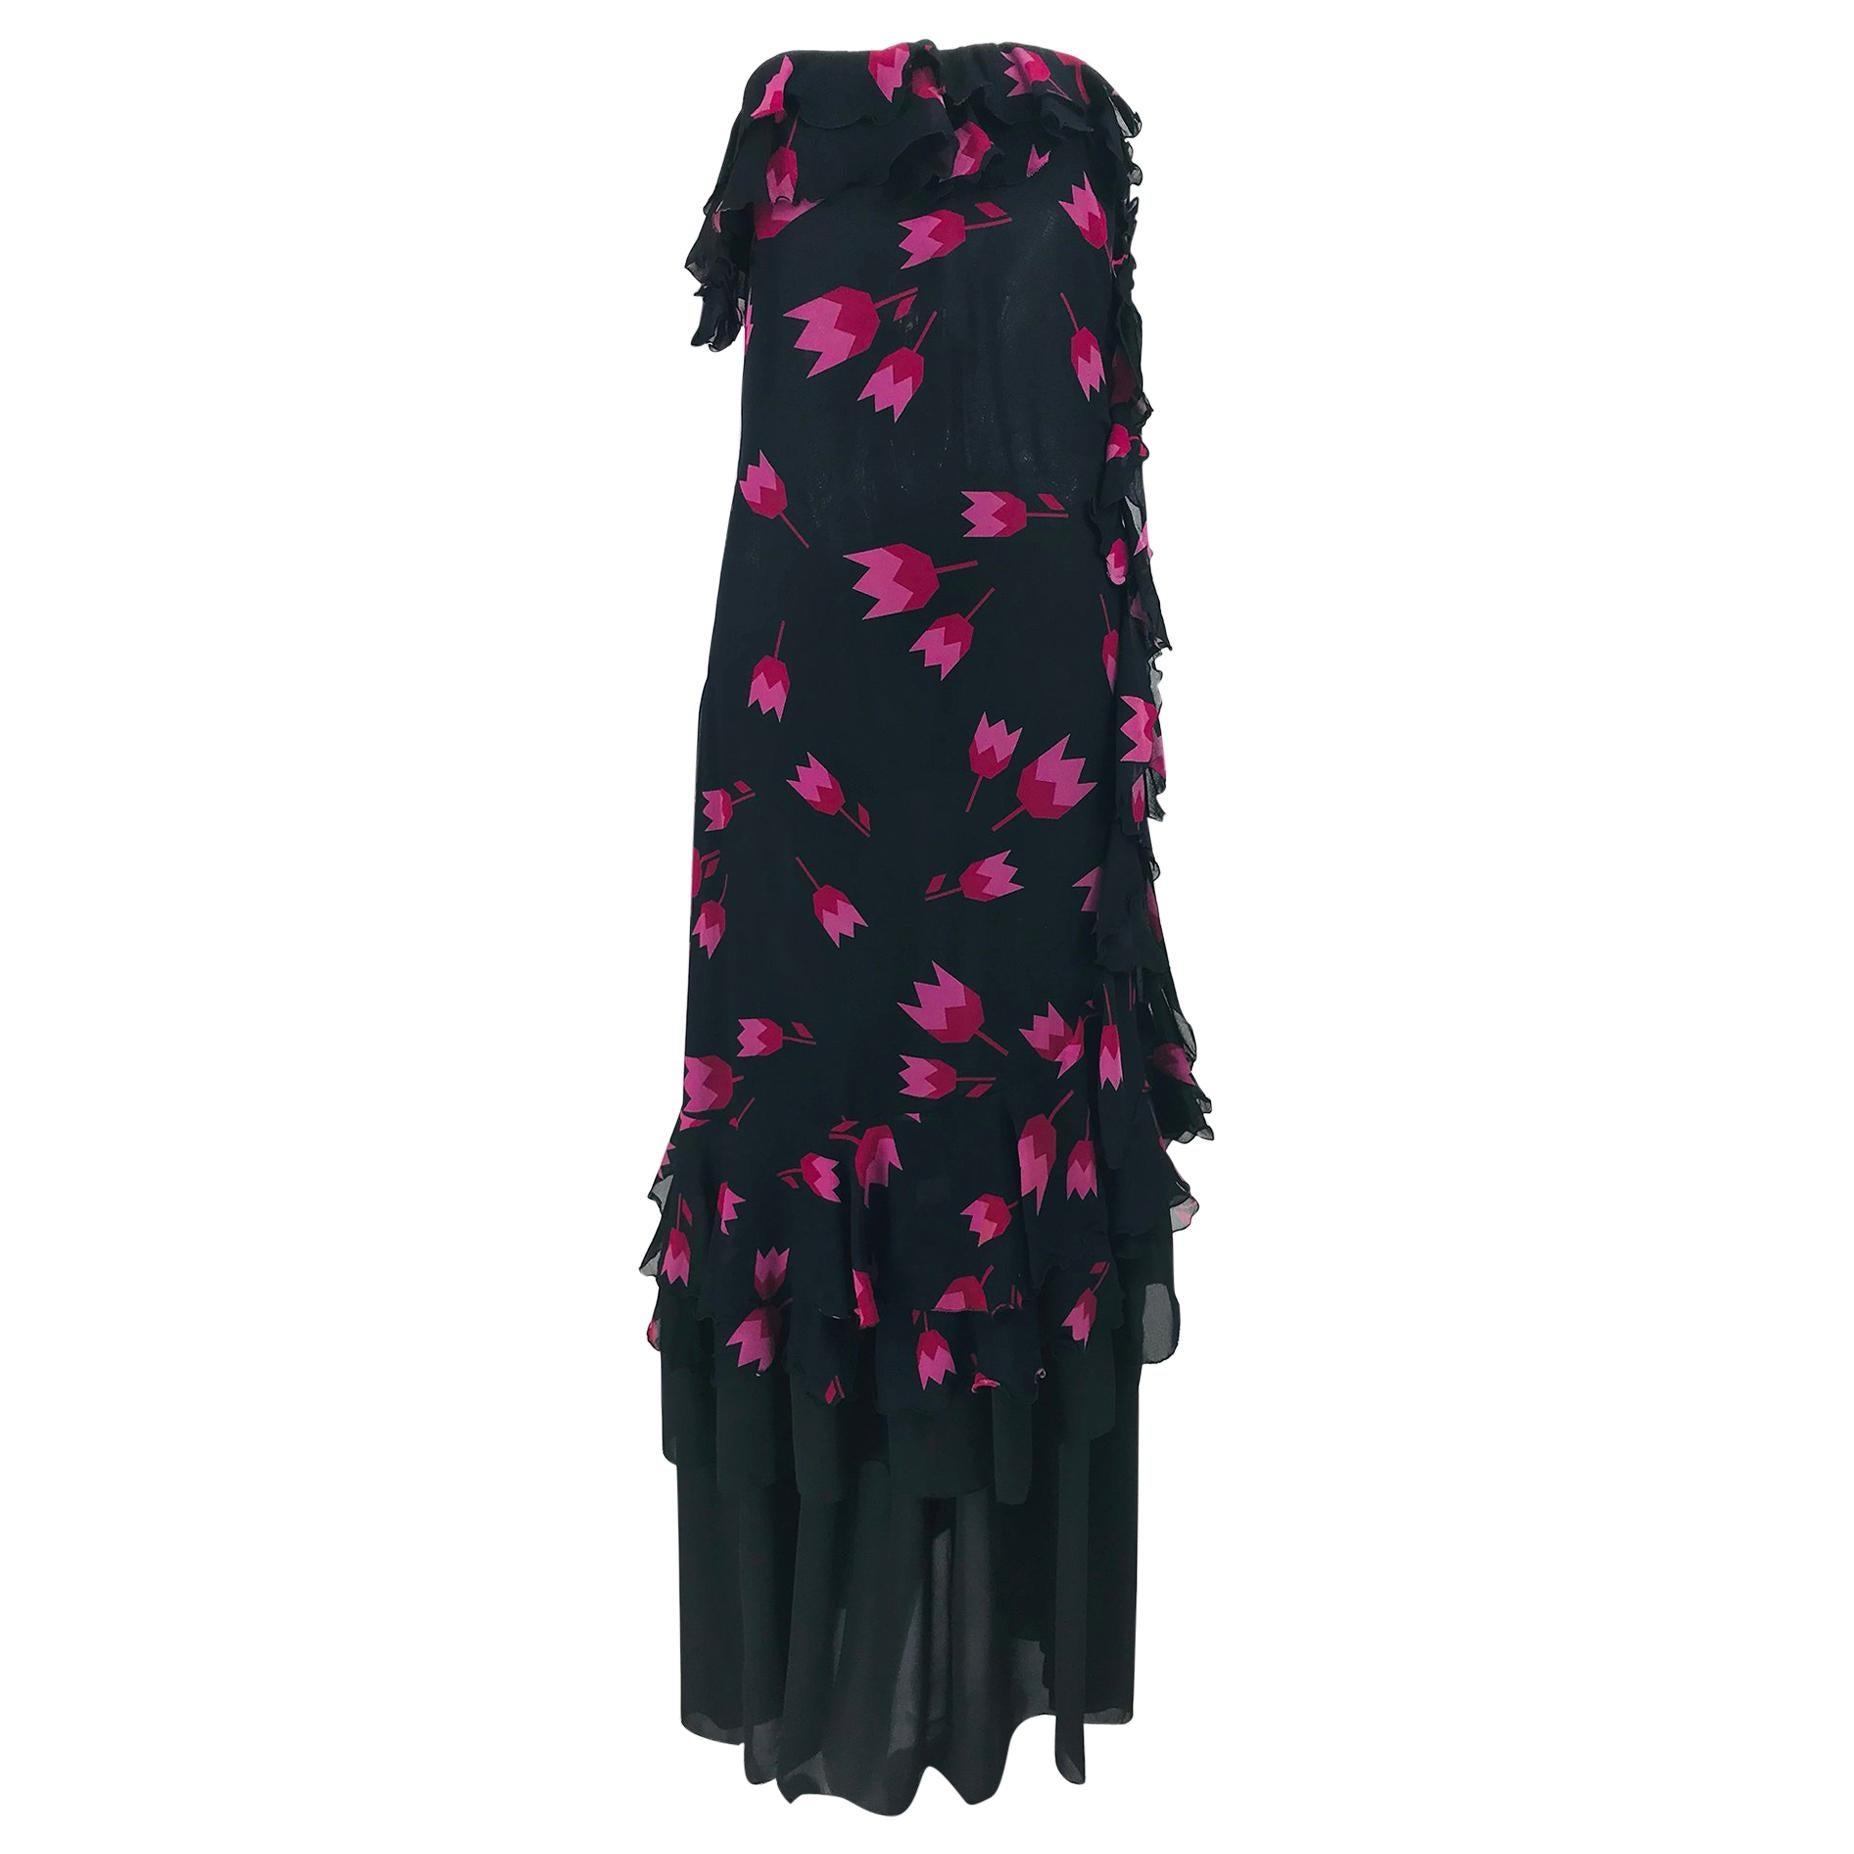 Christian Dior Boutique Paris Tulip print Strapless layered  Maxi Dress 1970s